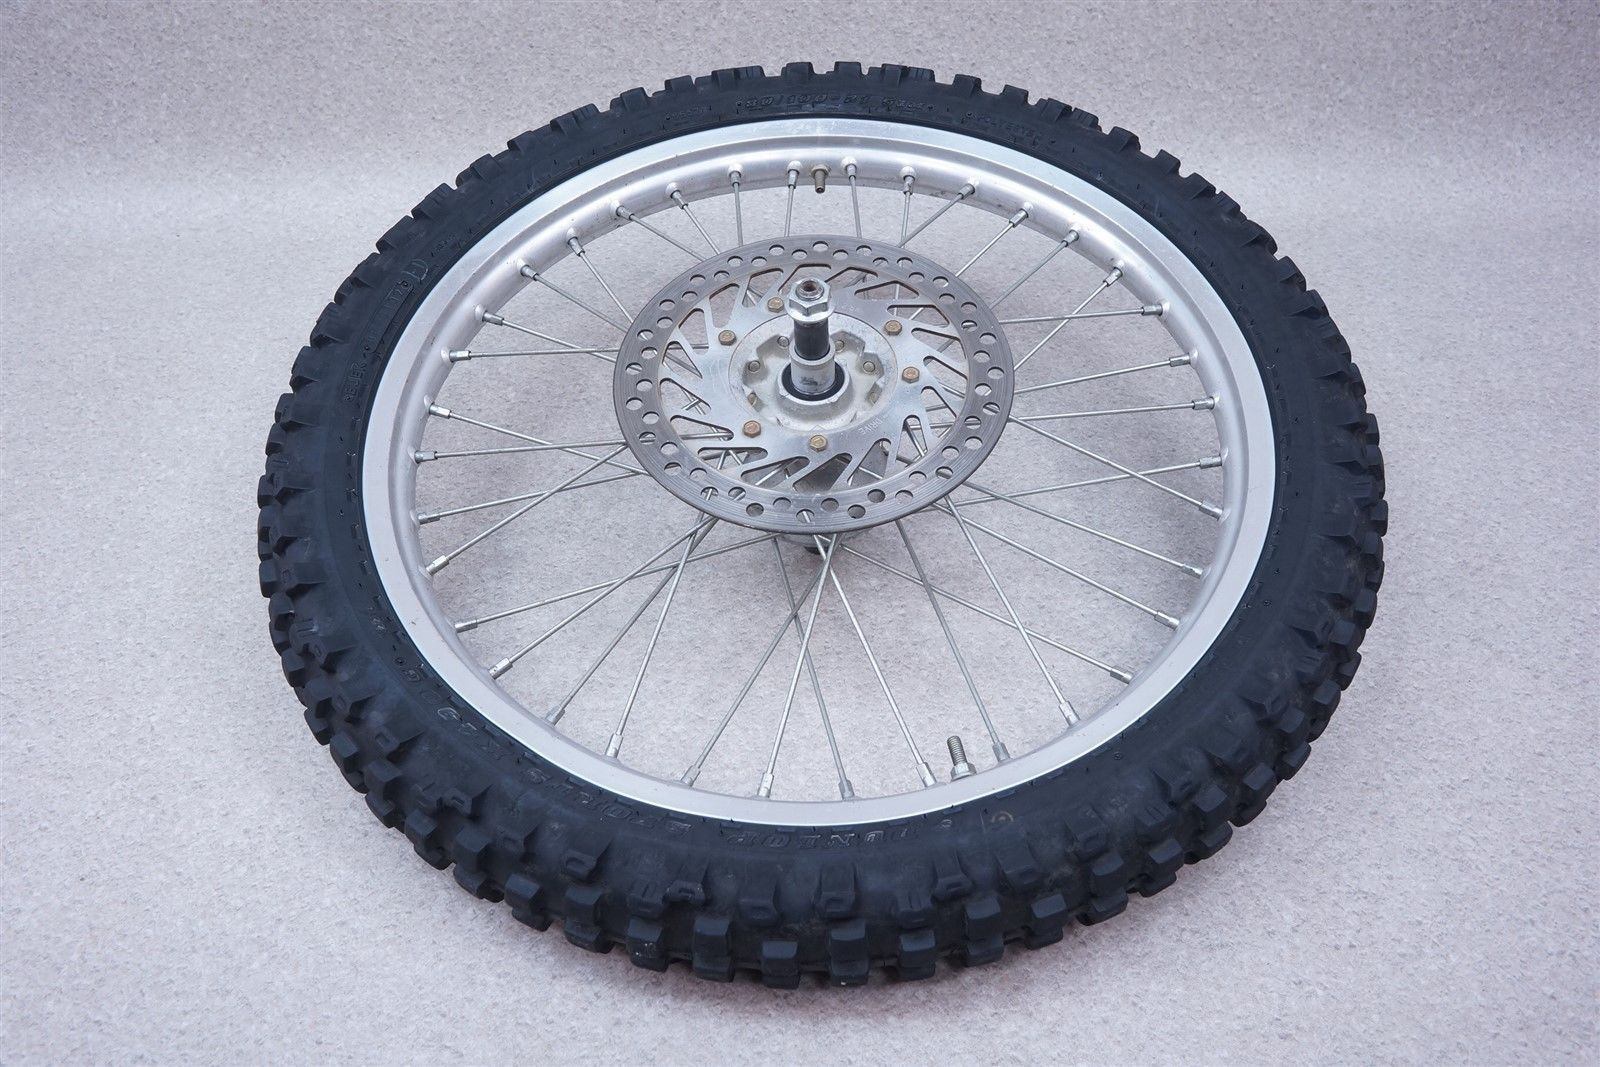 Http Motorcyclespareparts Net 2000 00 Honda Cr250 Cr 250 Stock Oem Front Wheel Rim Tire Rotor Axle Hub 2 2000 00 Honda Cr250 Cr 250 St Wheel Rims Axle Wheel